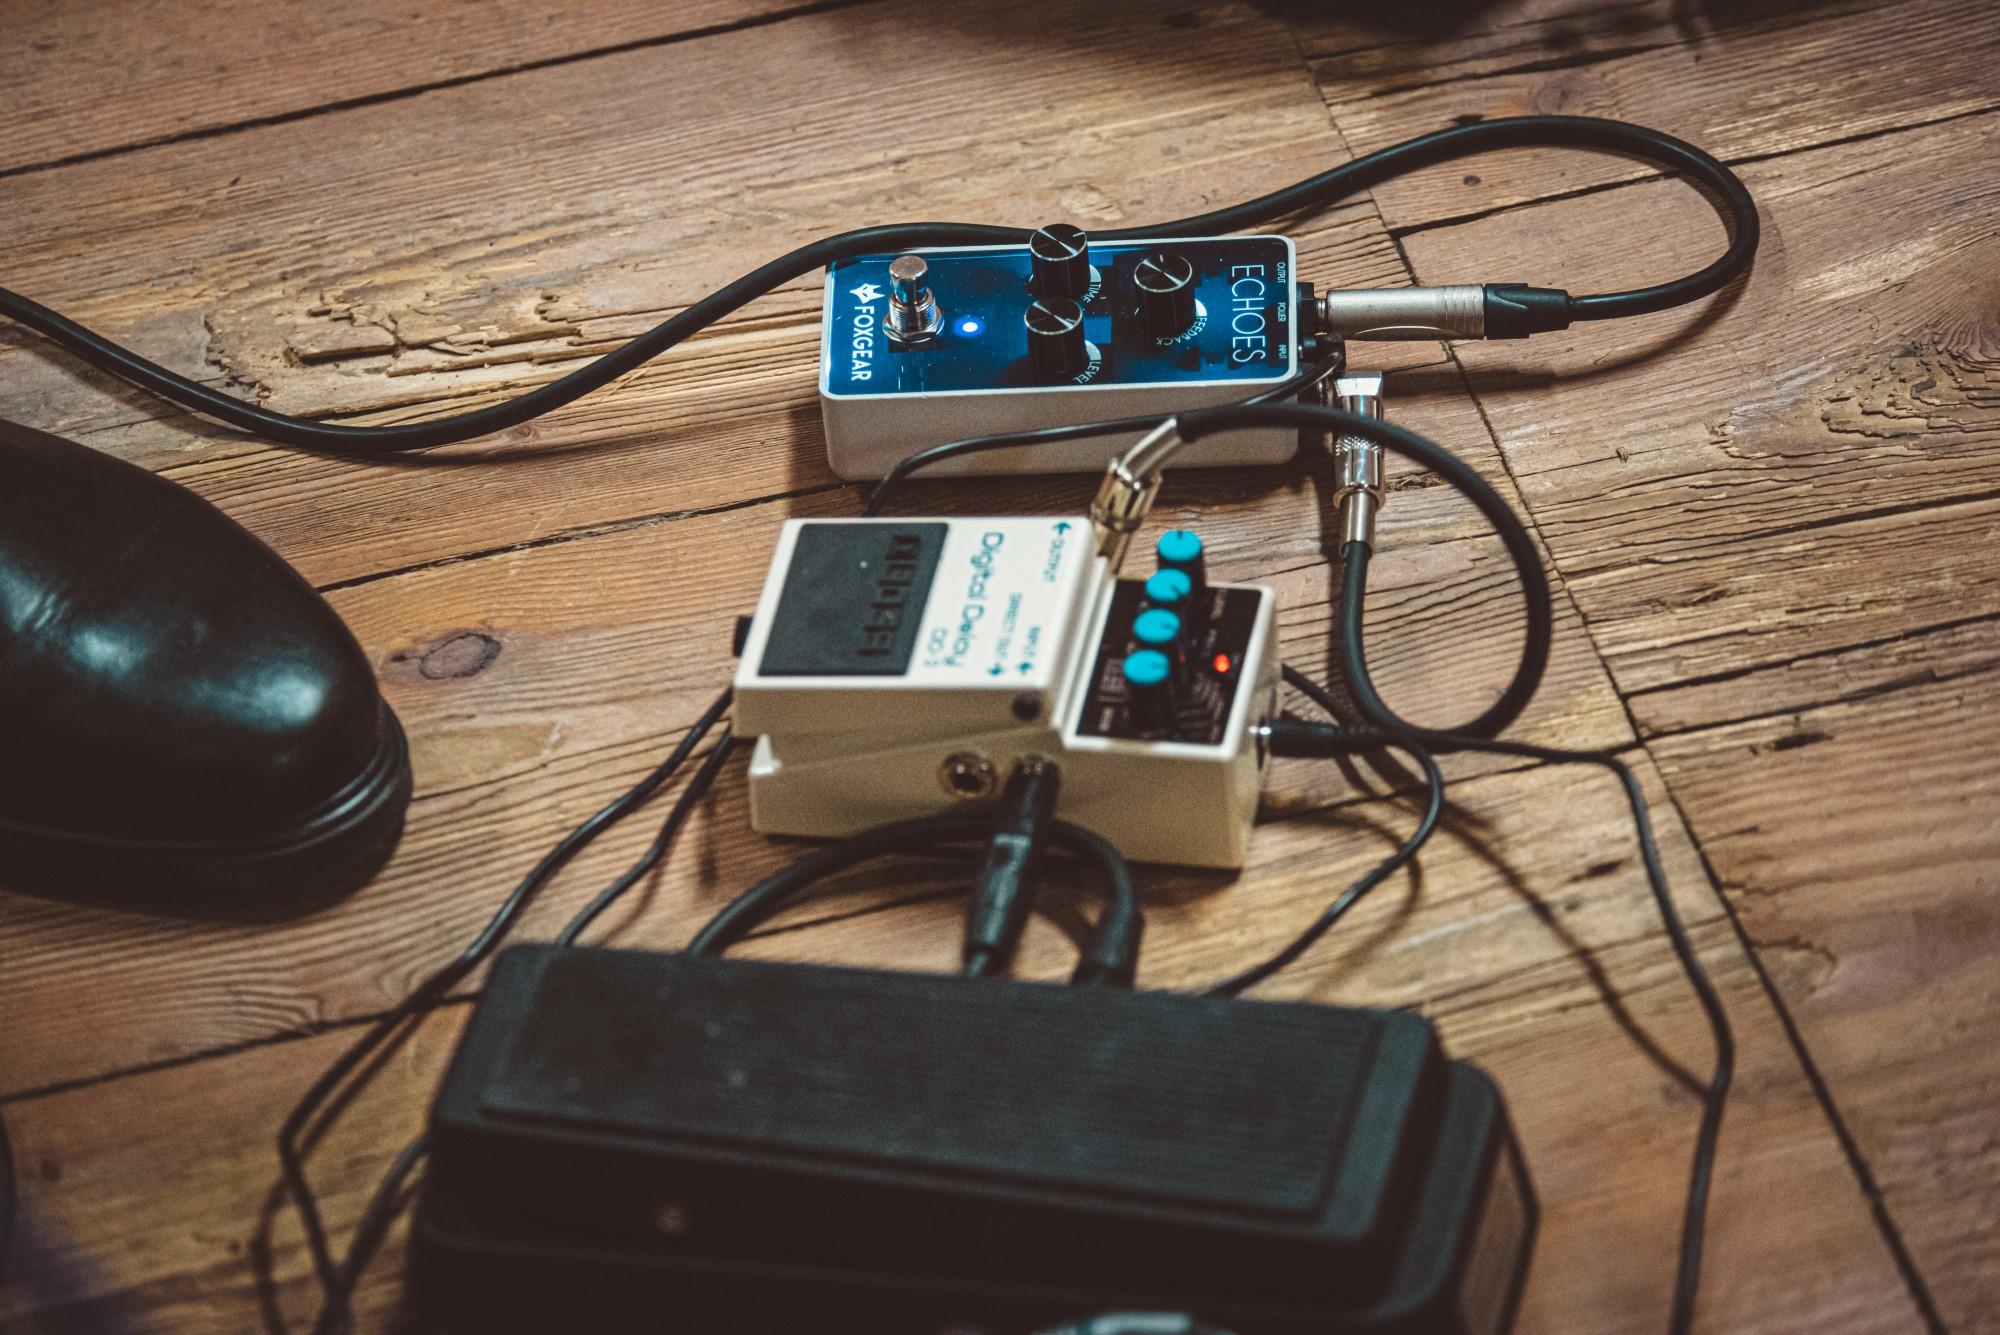 DSC 8617 - Loft and music